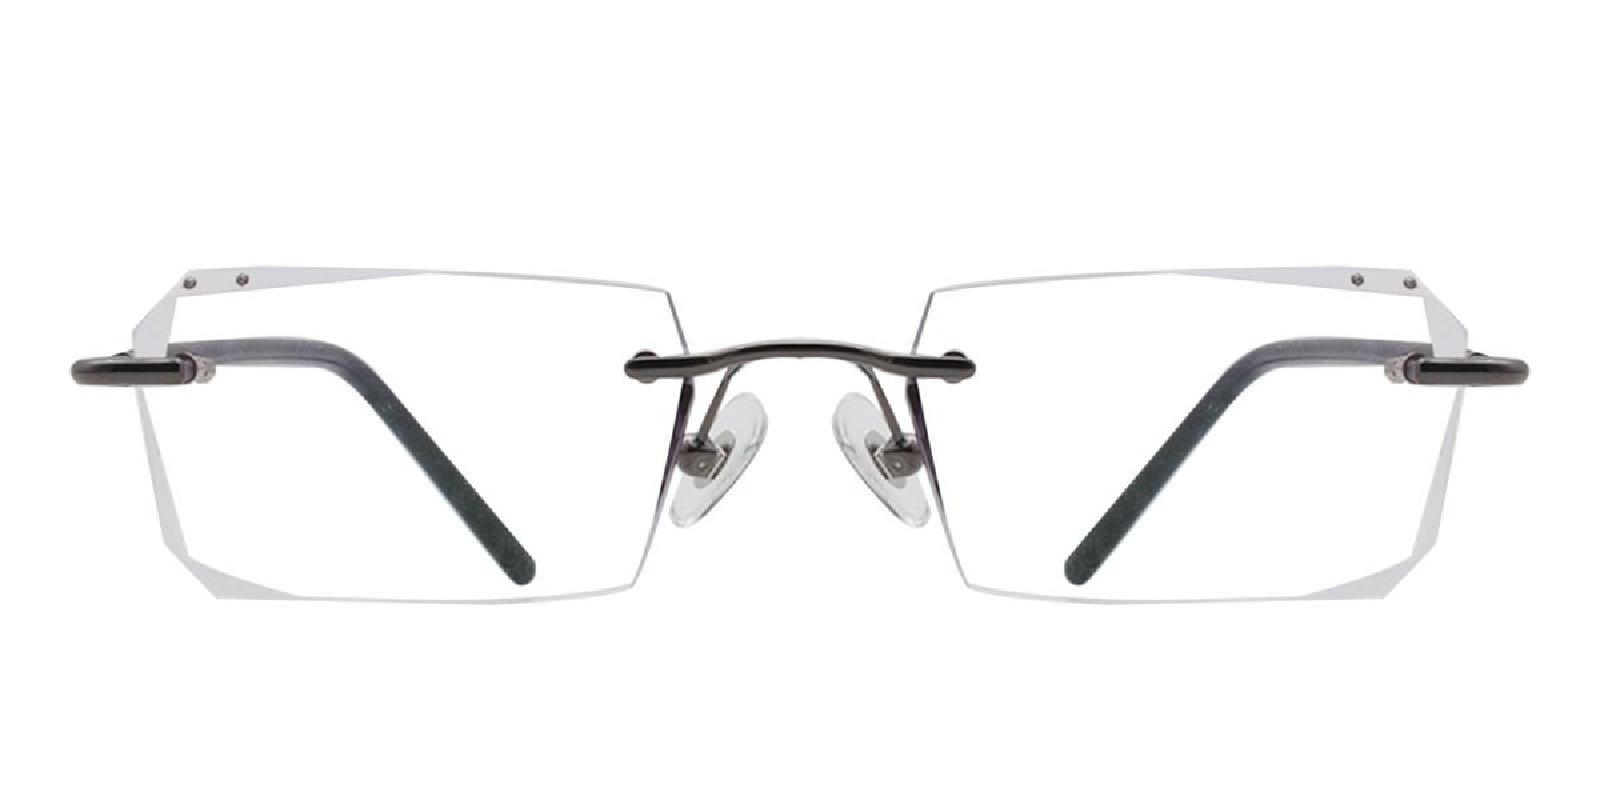 Thomas-Gun-Varieties-Titanium-Eyeglasses-additional2